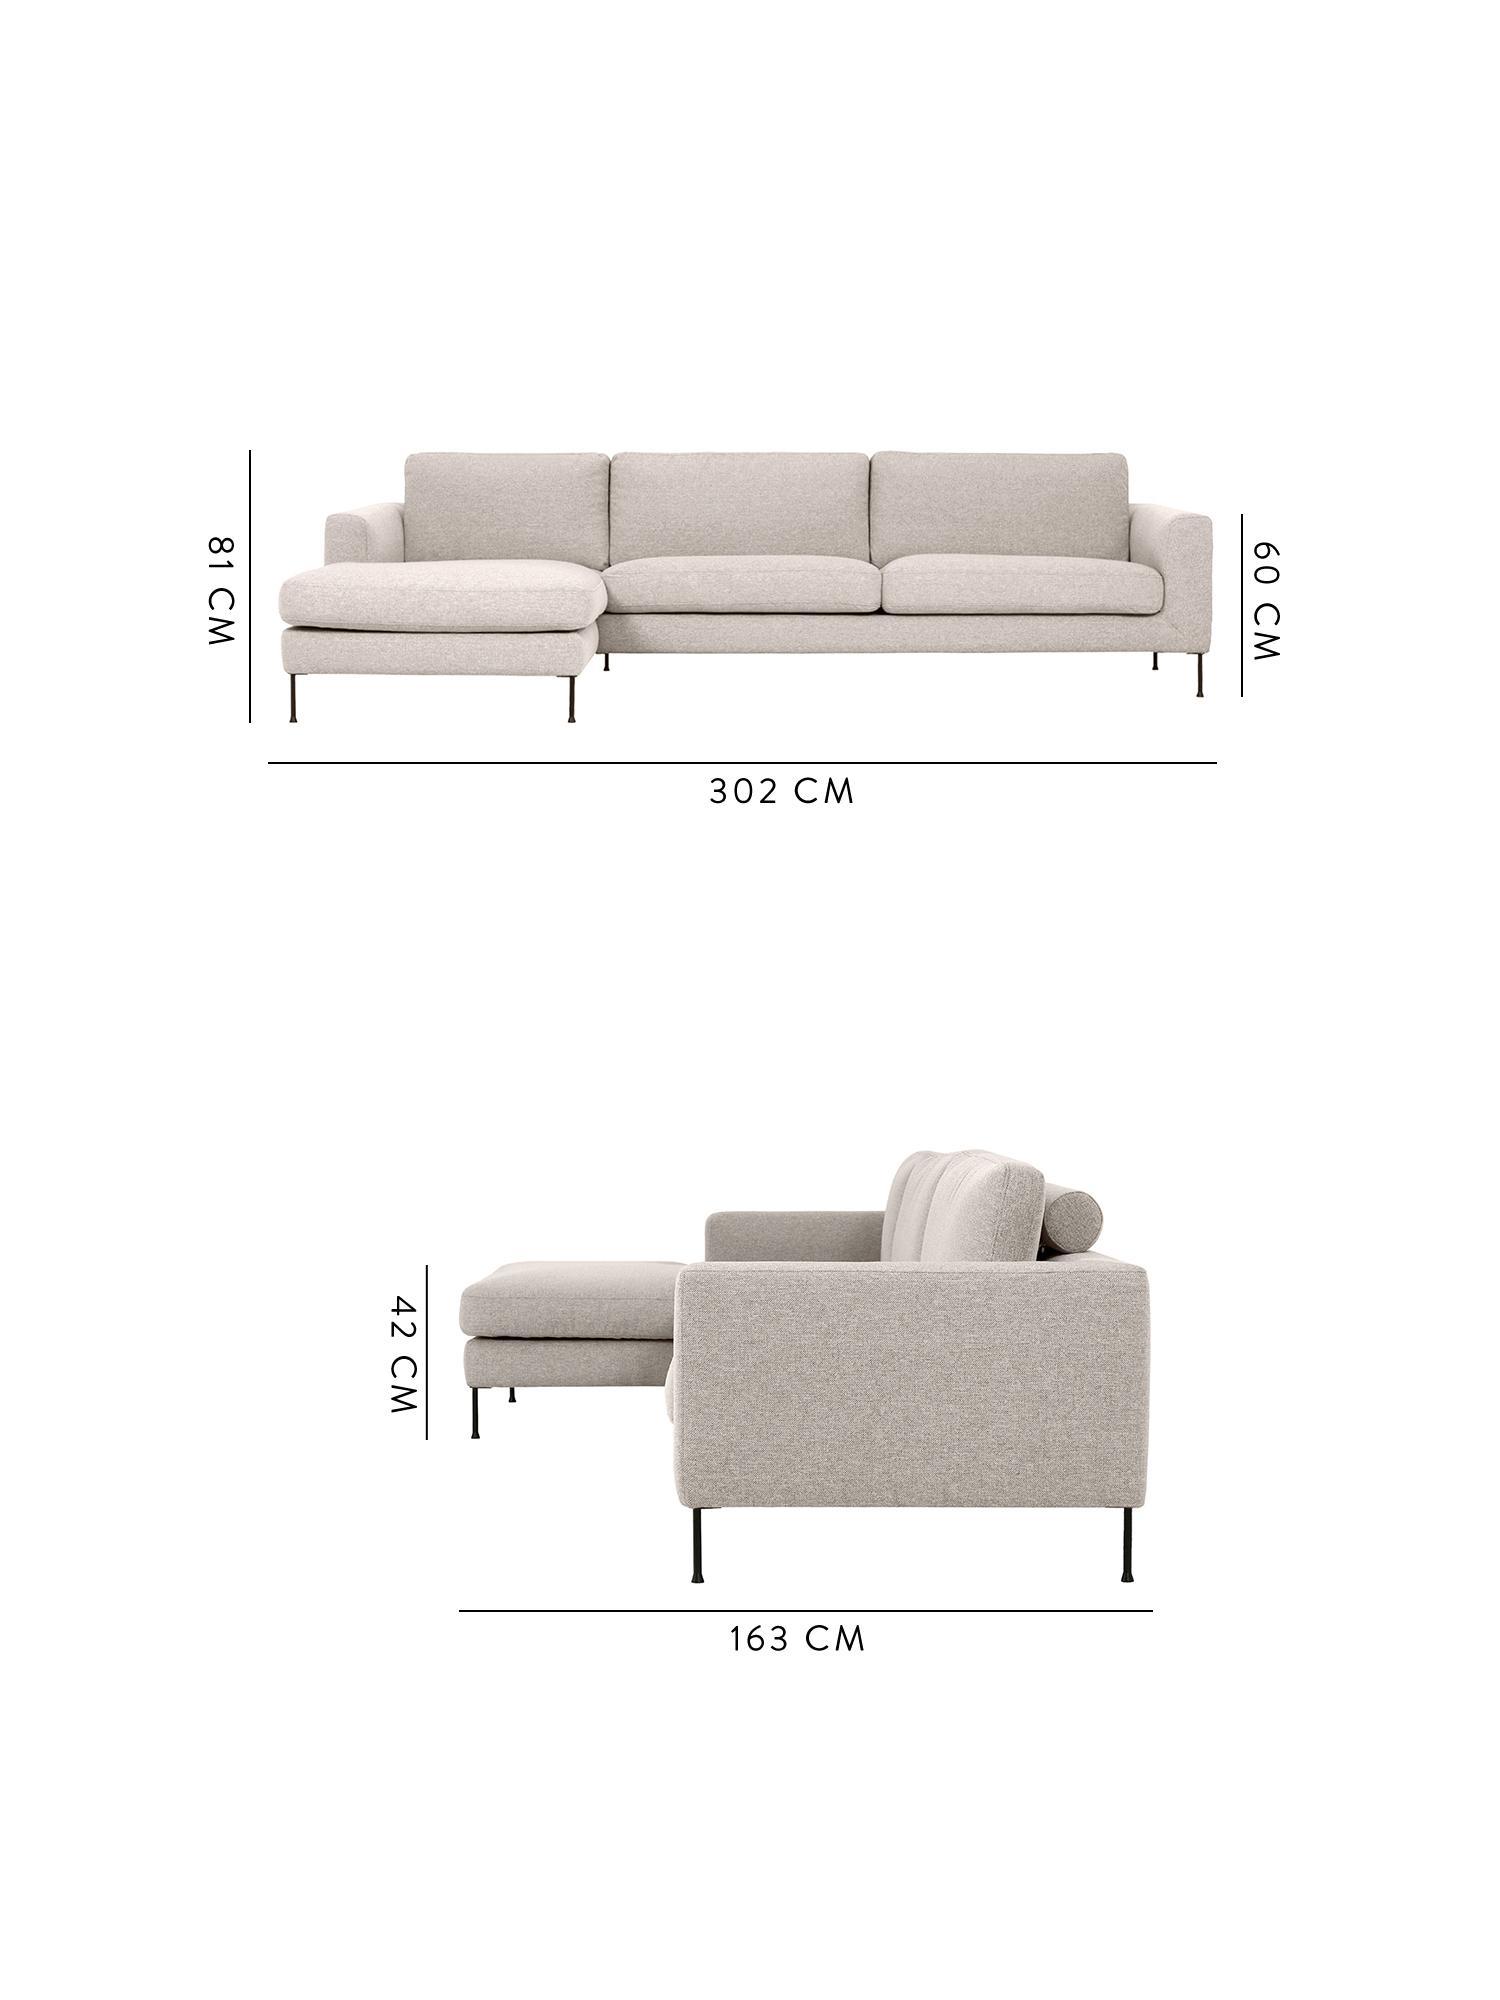 Hoekbank Cucita (4-zits), Bekleding: geweven stof (polyester), Frame: massief grenenhout, Poten: gelakt metaal, Geweven stof beige, B 302 x D 163 cm